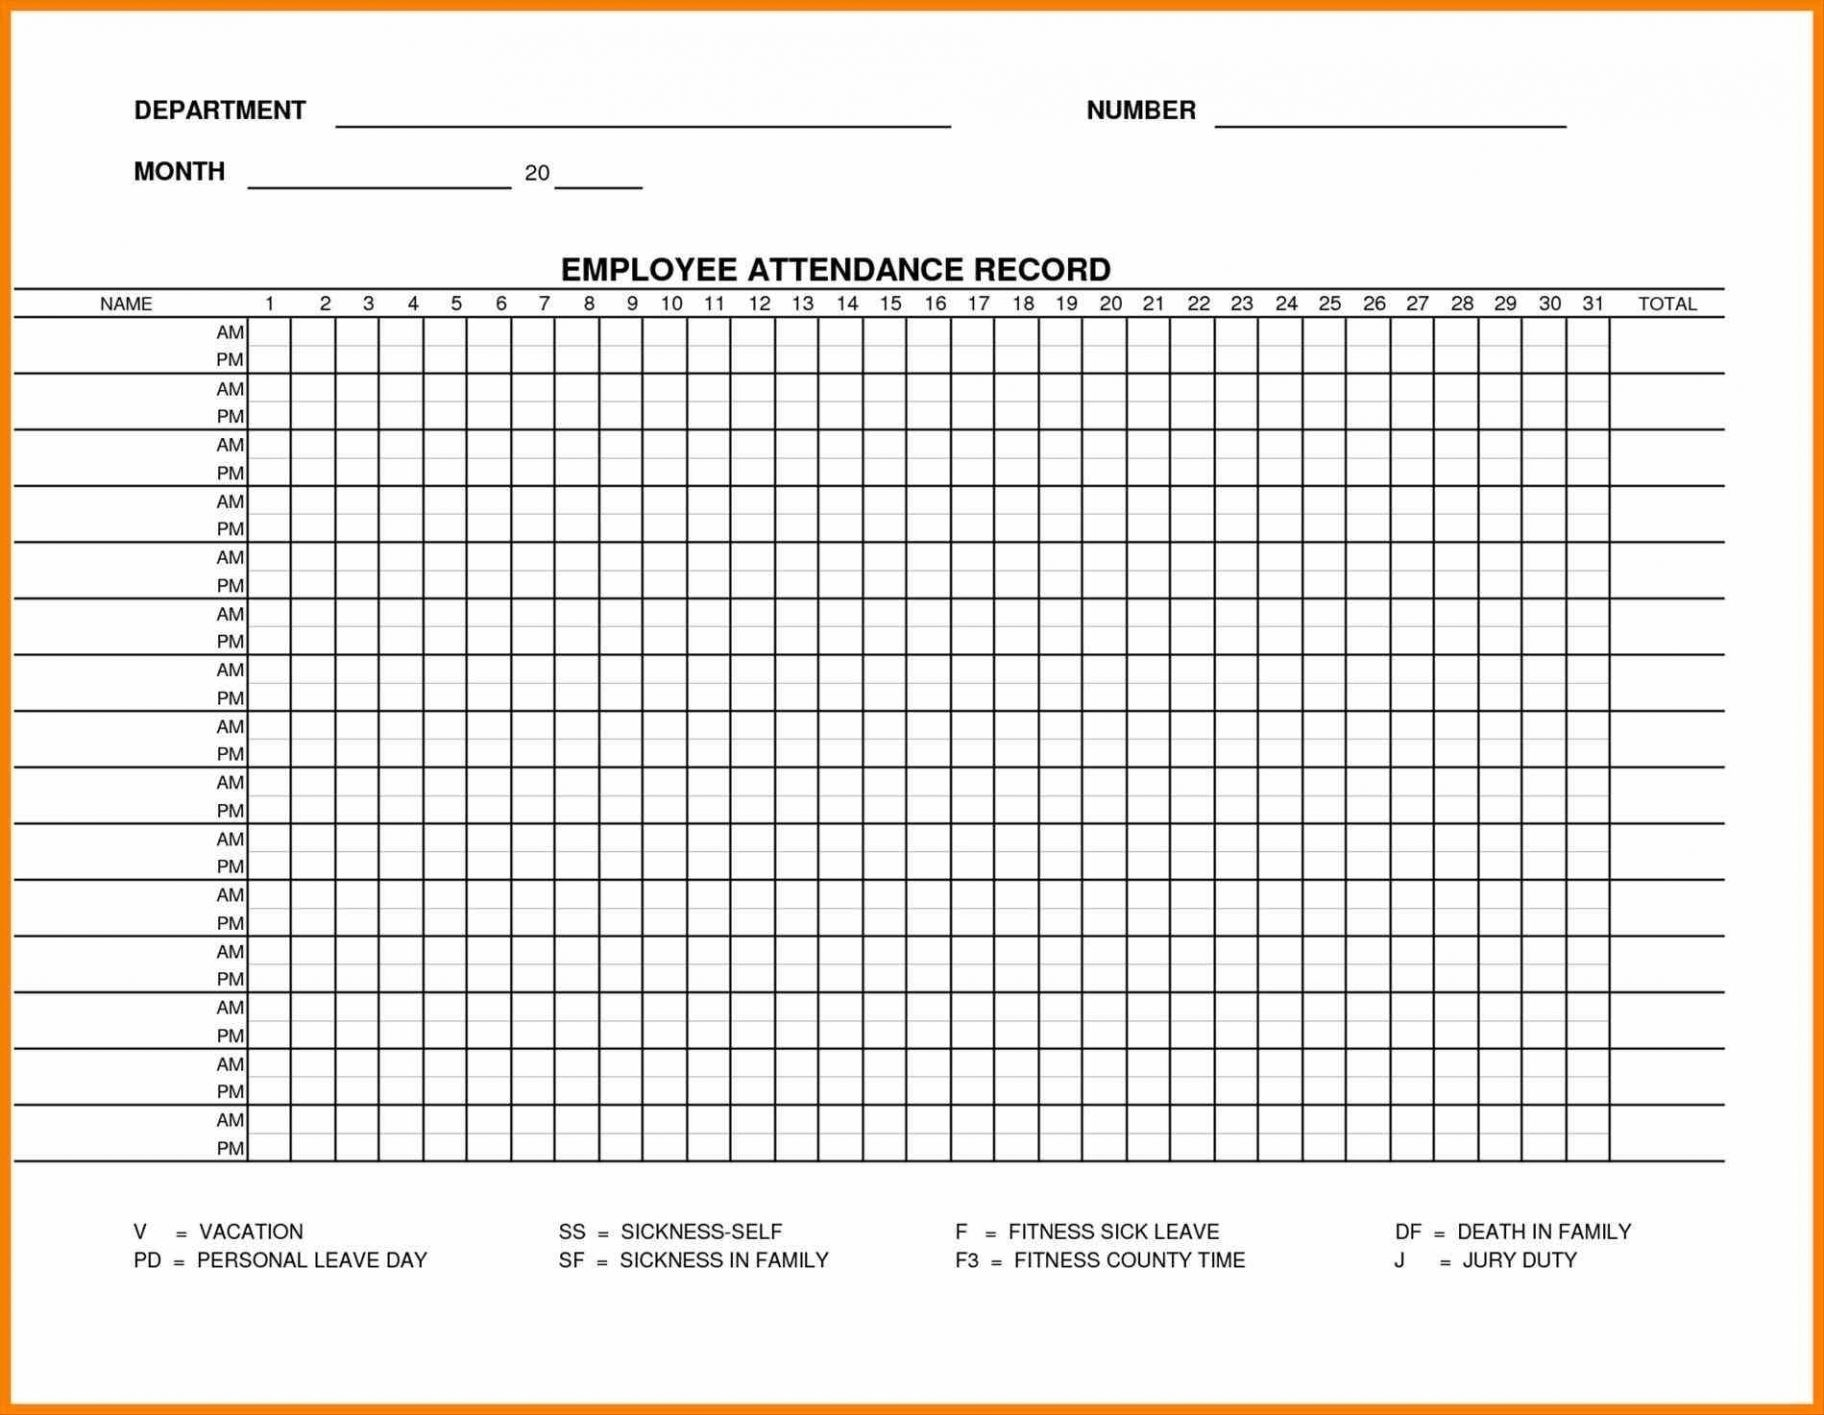 Printable Employee Attendance Sheet Excel 2018 Within Employee with regard to Printable Employee Attendance Calendar Template Excel